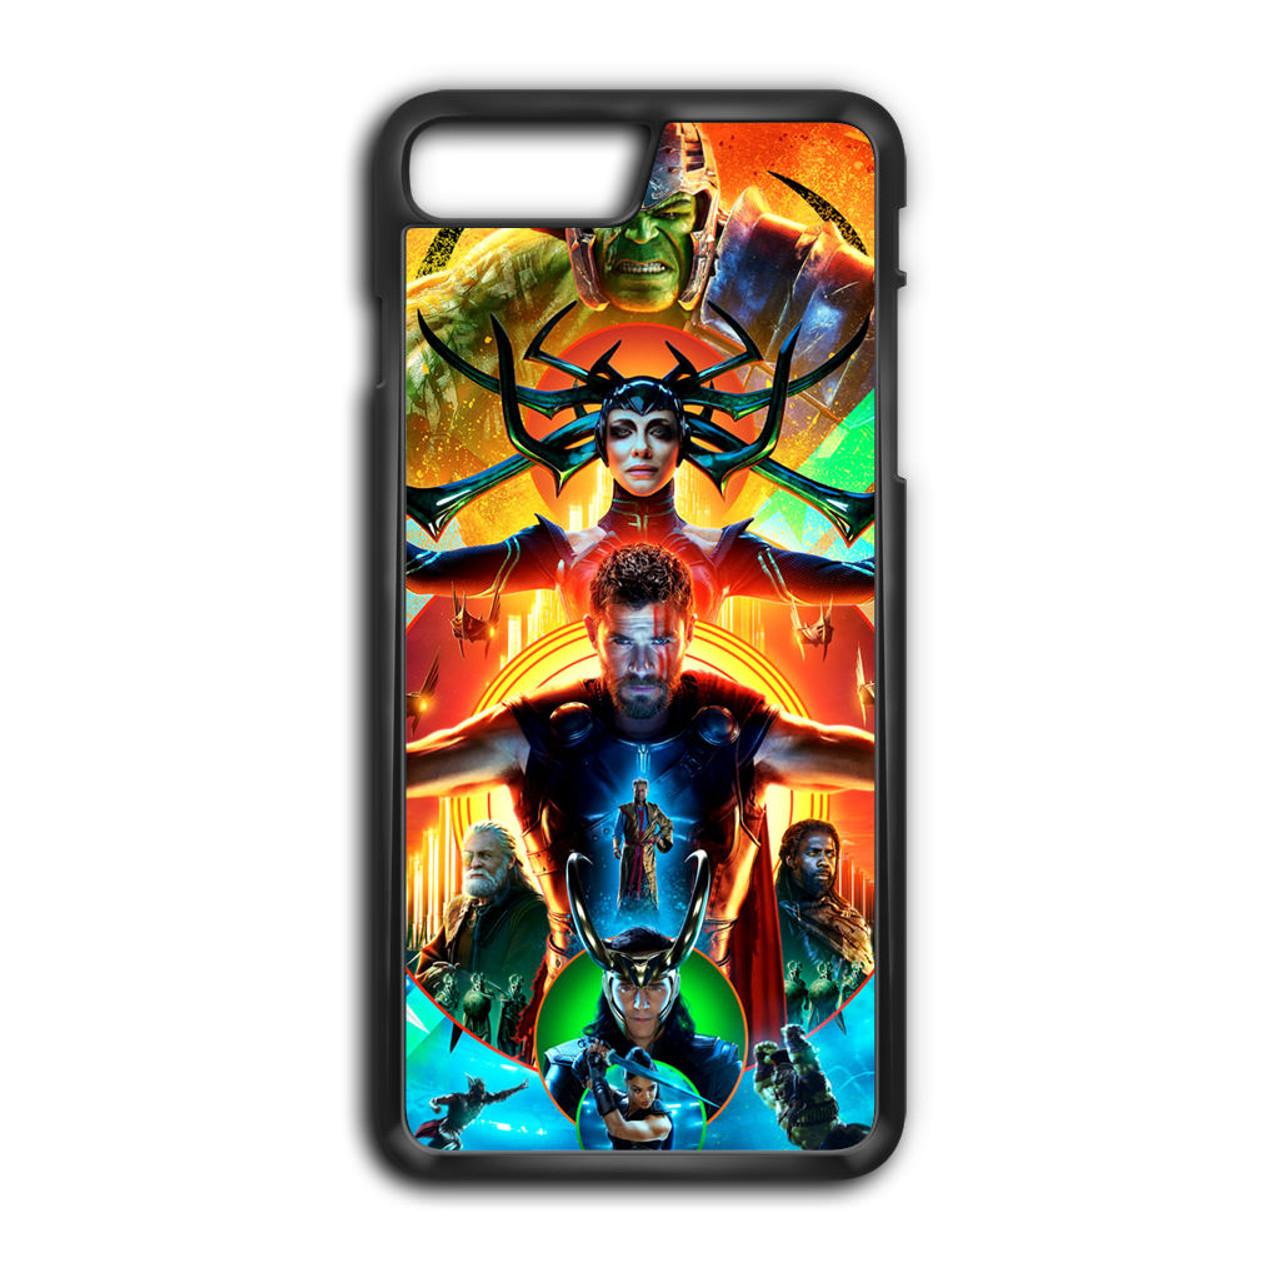 the latest 48cb6 73cad Hulk Hela Thor In Thor Ragnarok iPhone 7 Plus Case